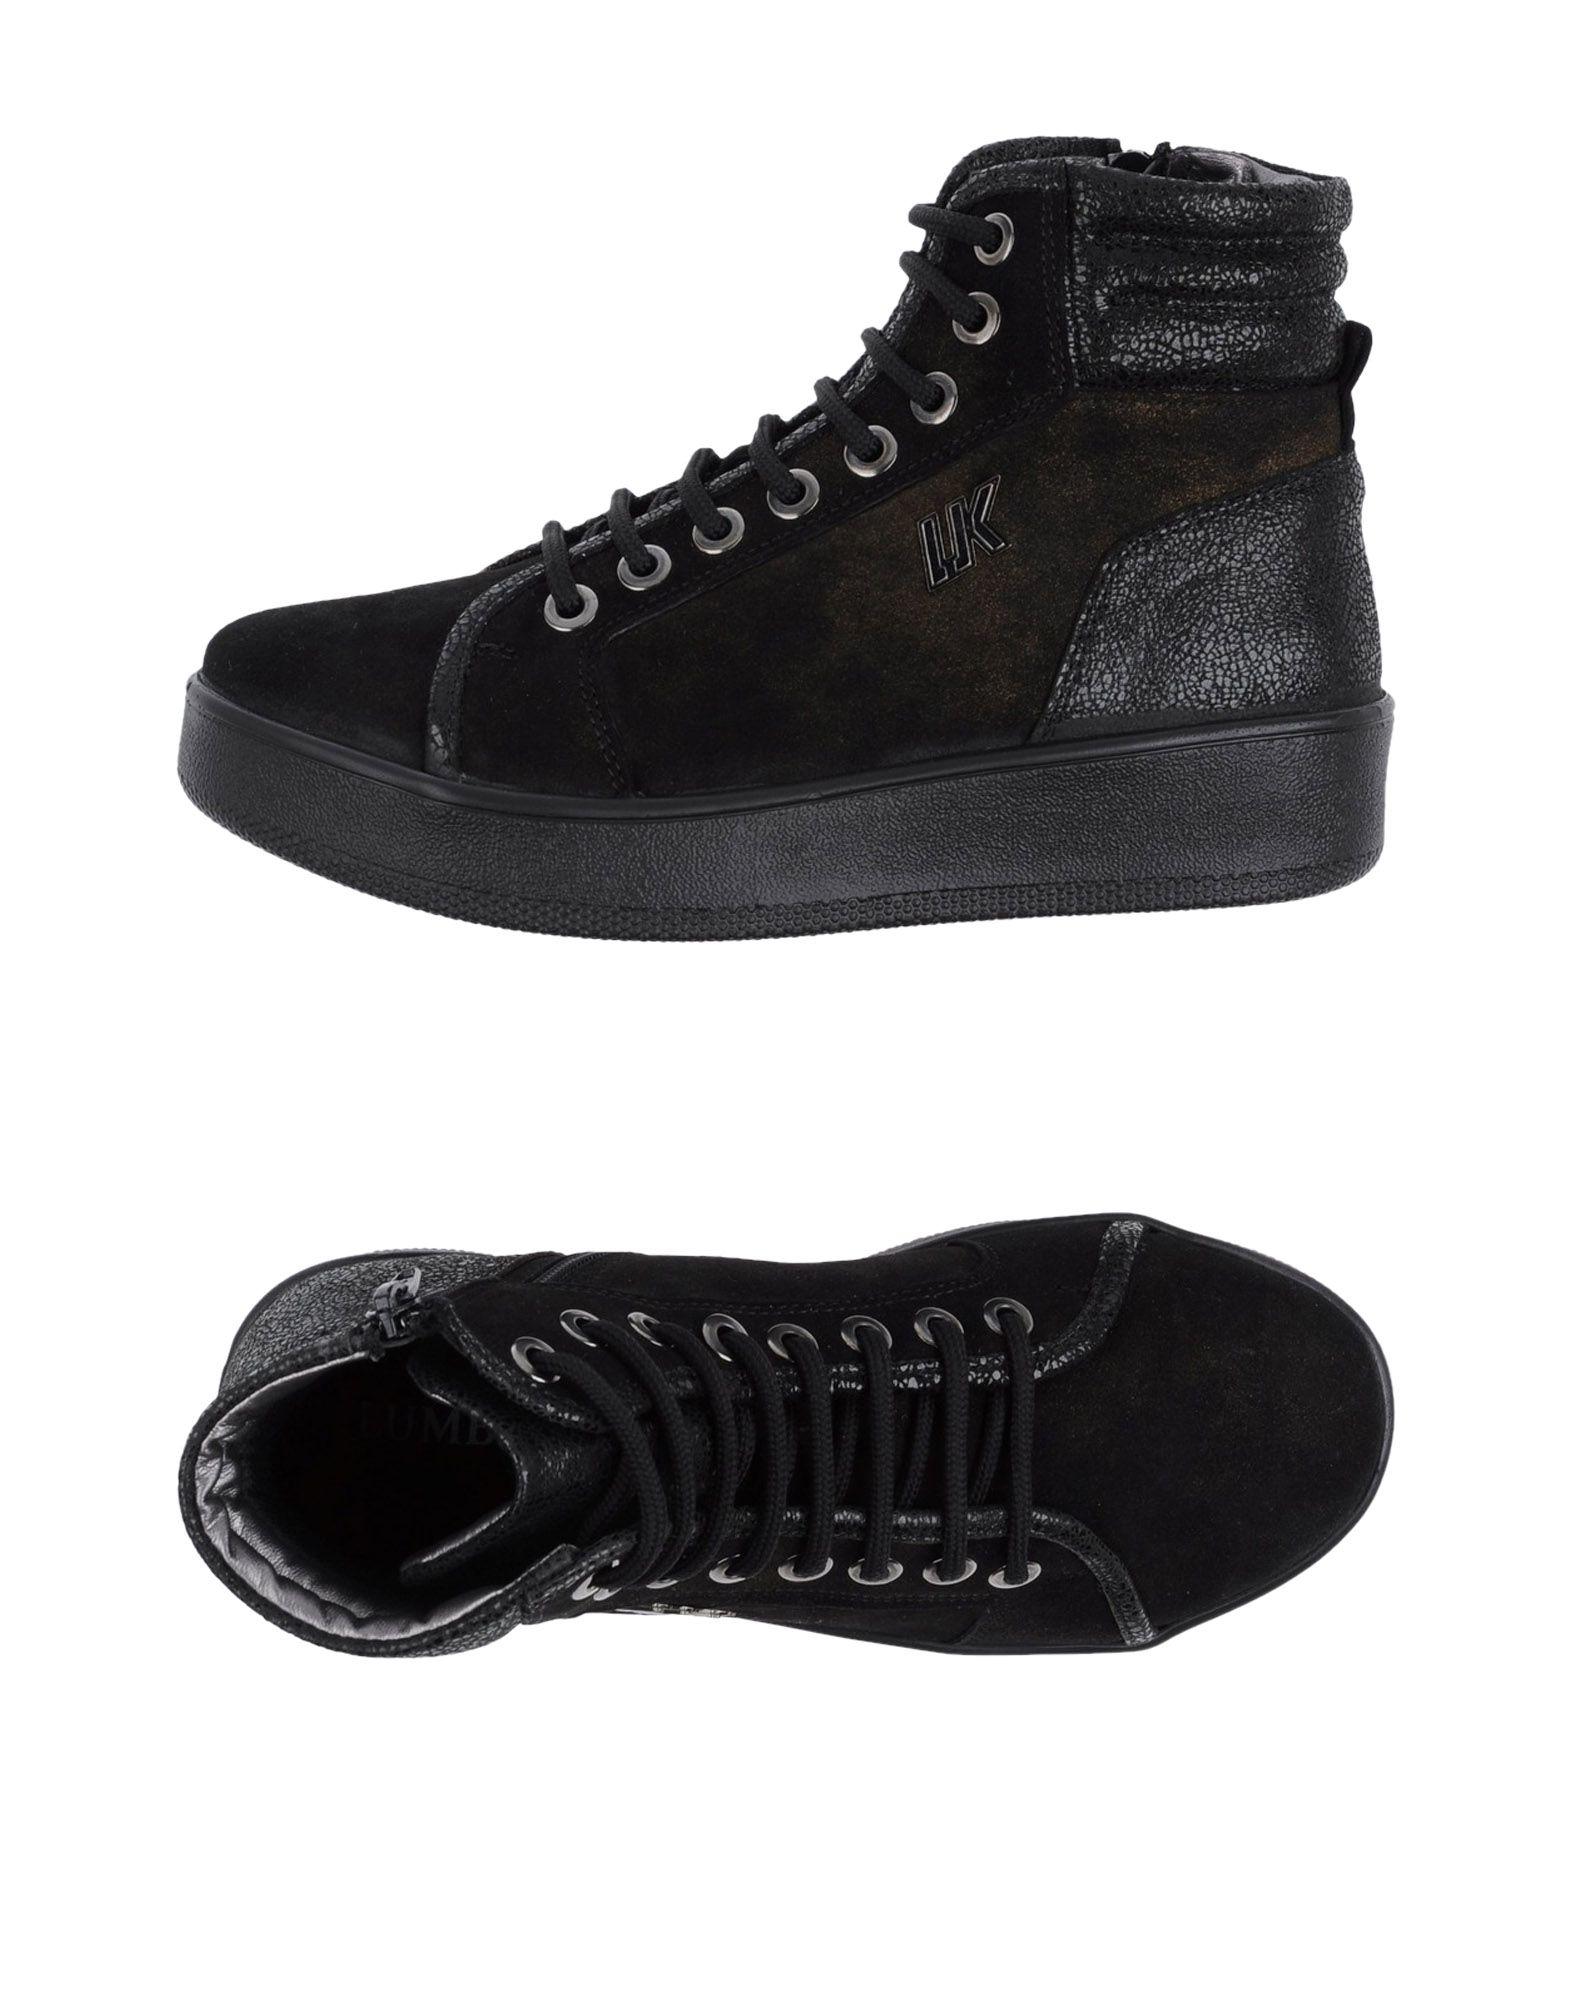 LUMBERJACK Высокие кеды и кроссовки кеды кроссовки высокие dc council mid tx stone camo